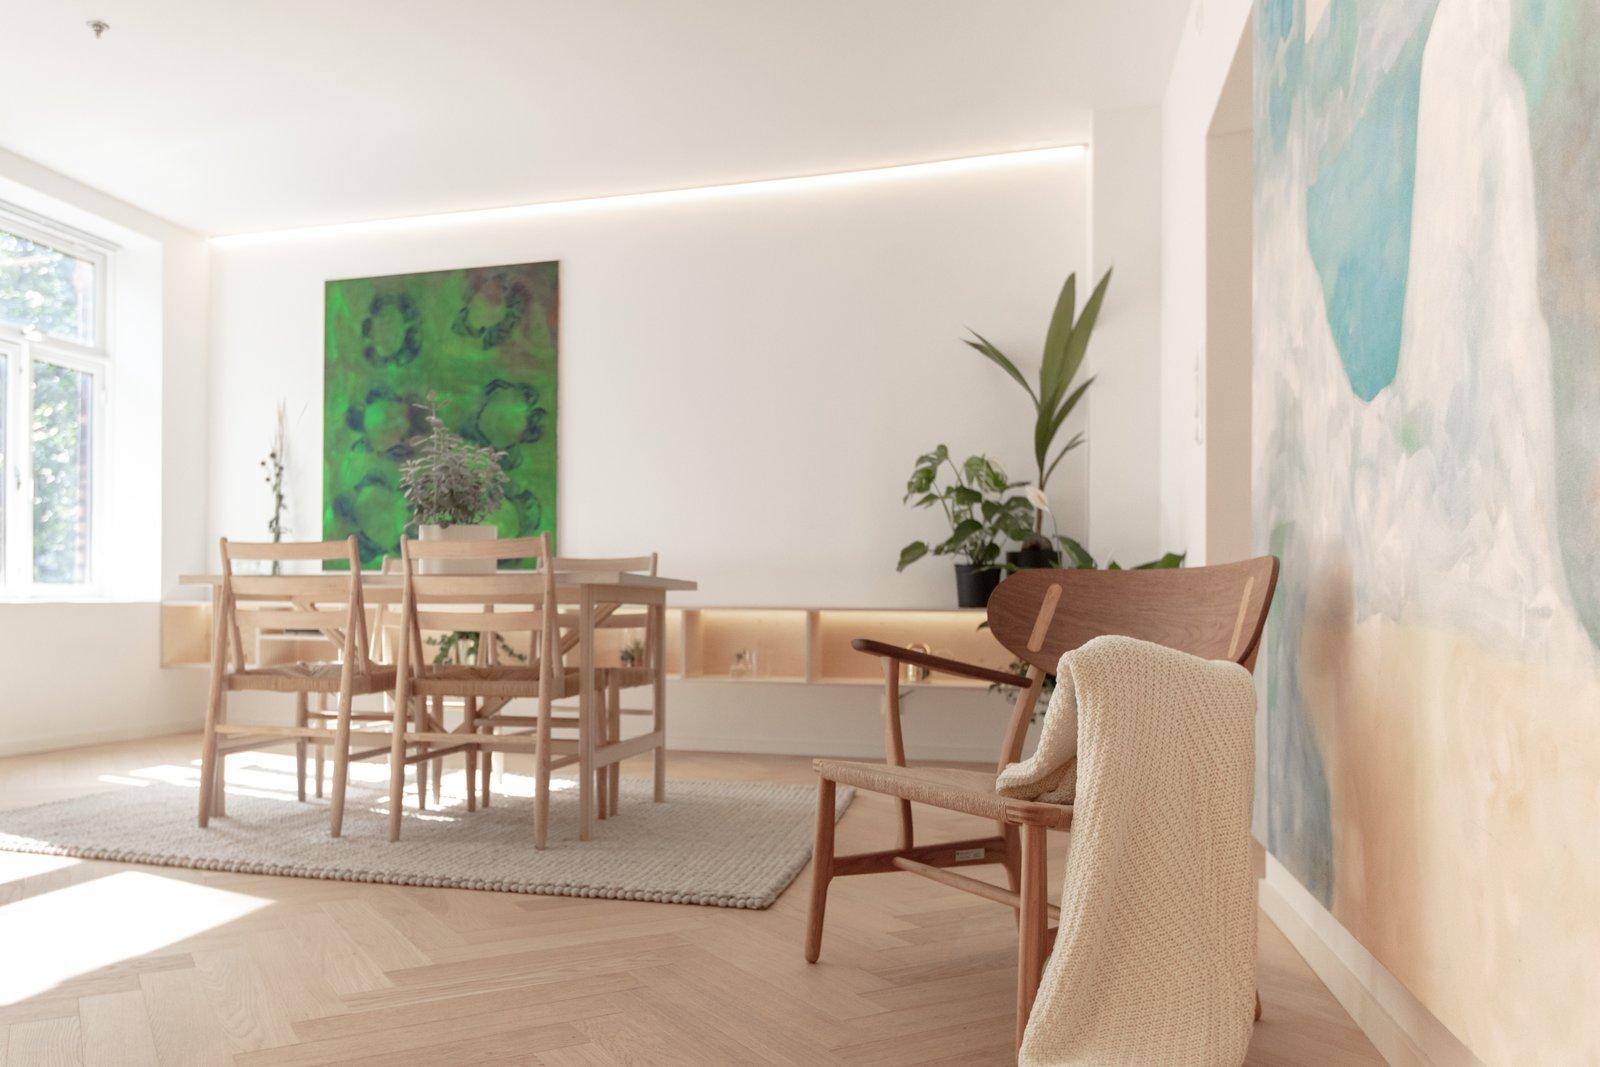 Living Room, Medium Hardwood Floor, Ceiling Lighting, and Chair Living room  Scandinavian/Japanese concept home in Oslo city center